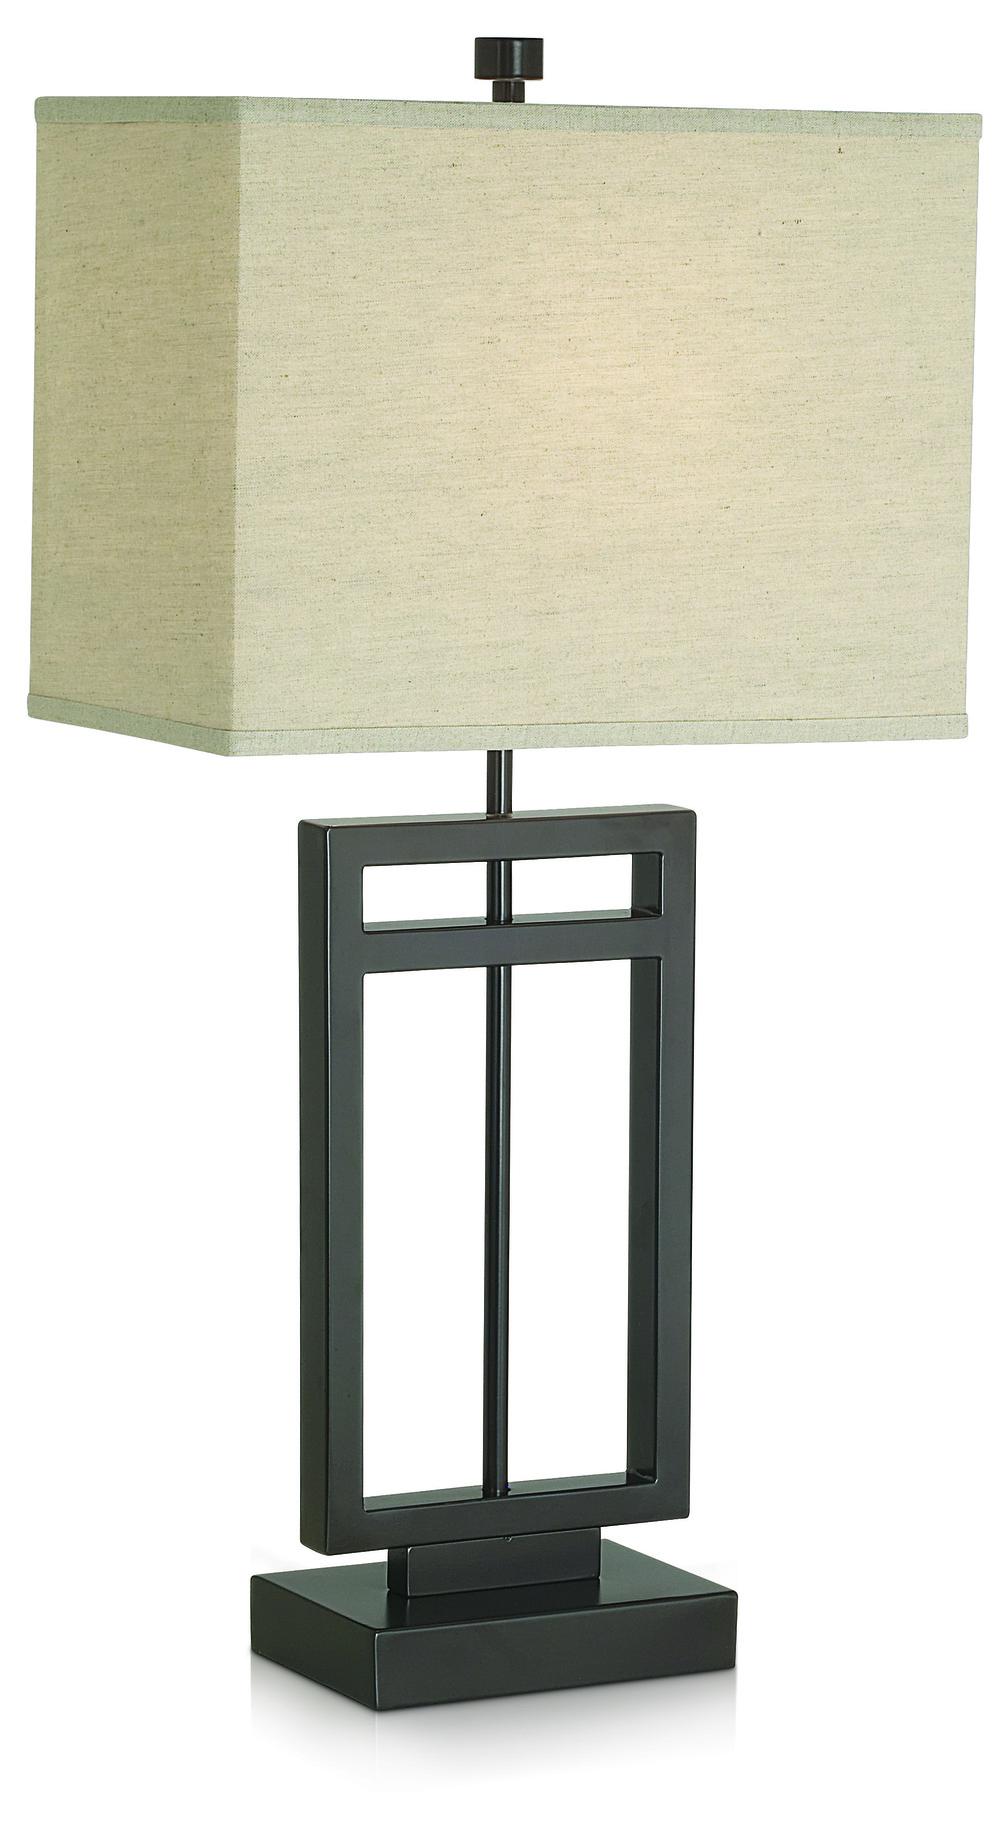 Pacific Coast Lighting - Central Loft Table Lamp